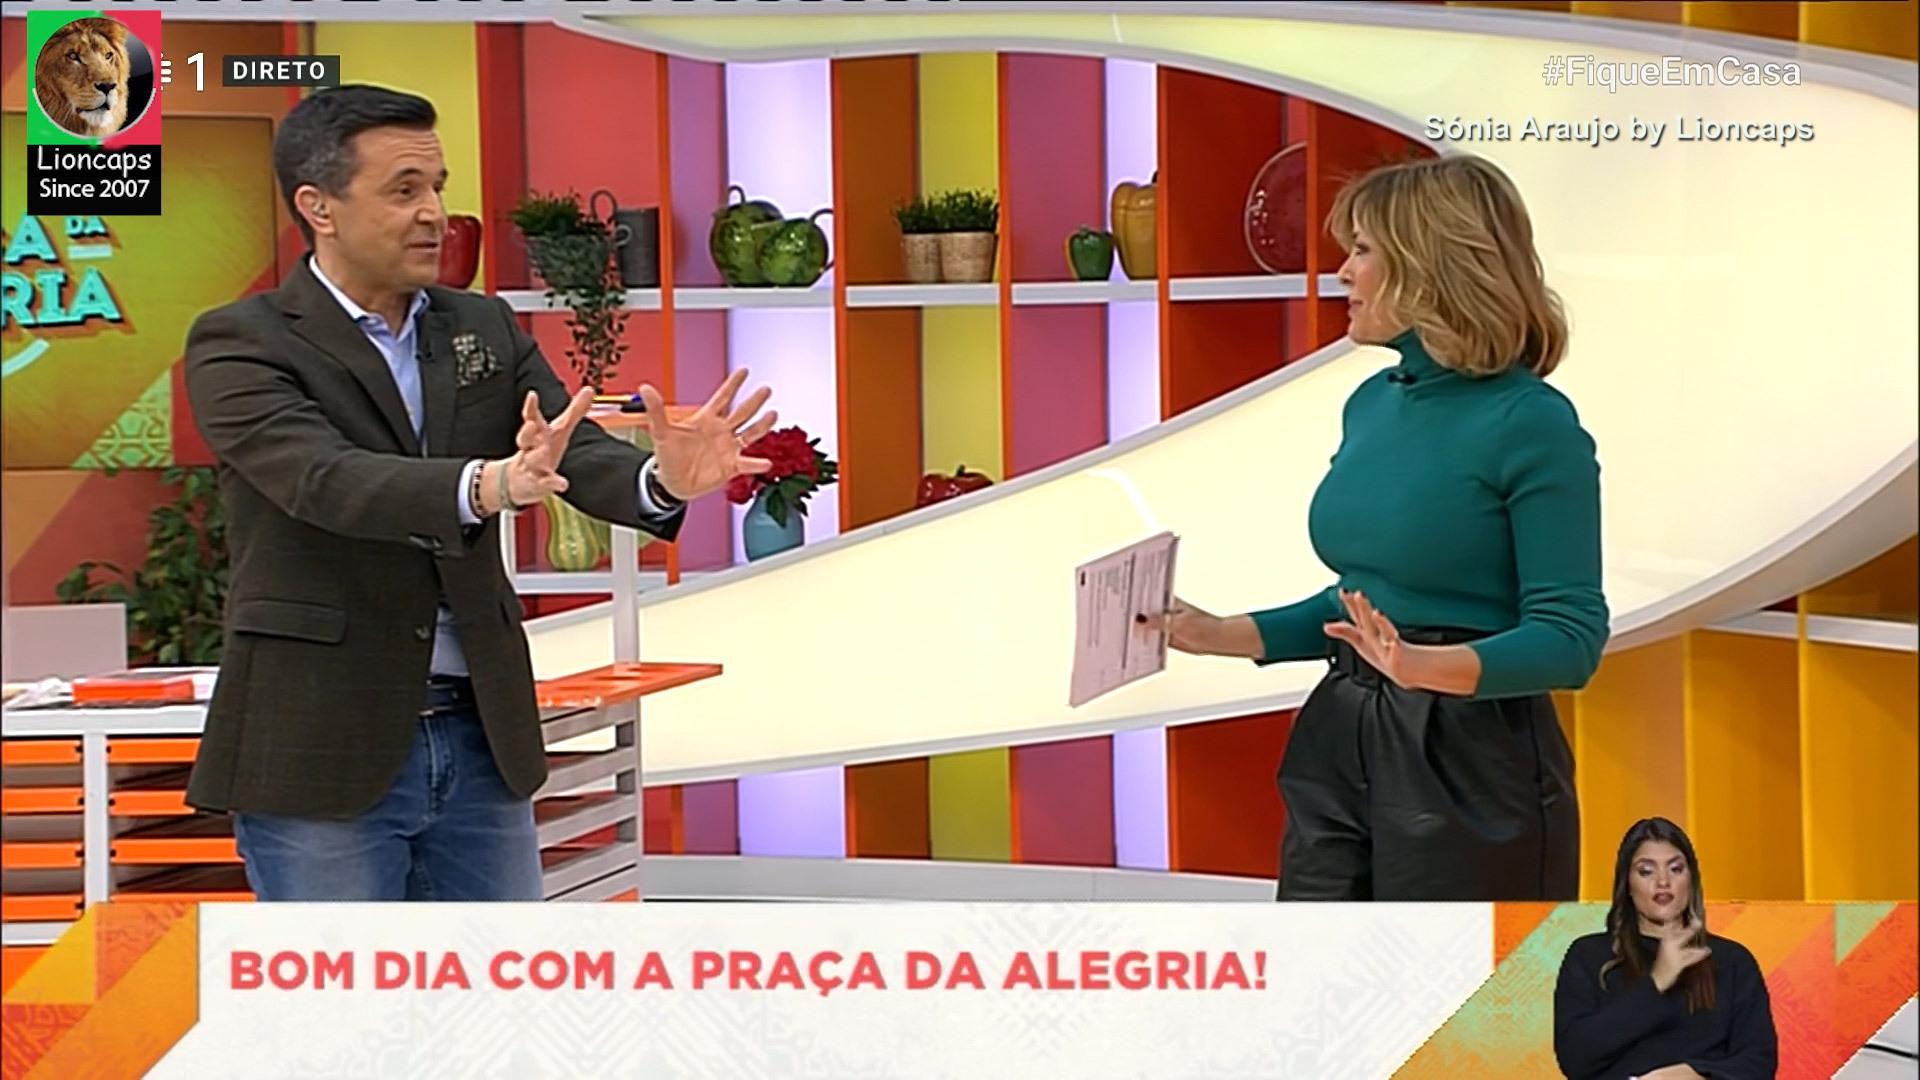 sonia_araujo_praca_lioncaps_27_03_2021_03 (8).jpg